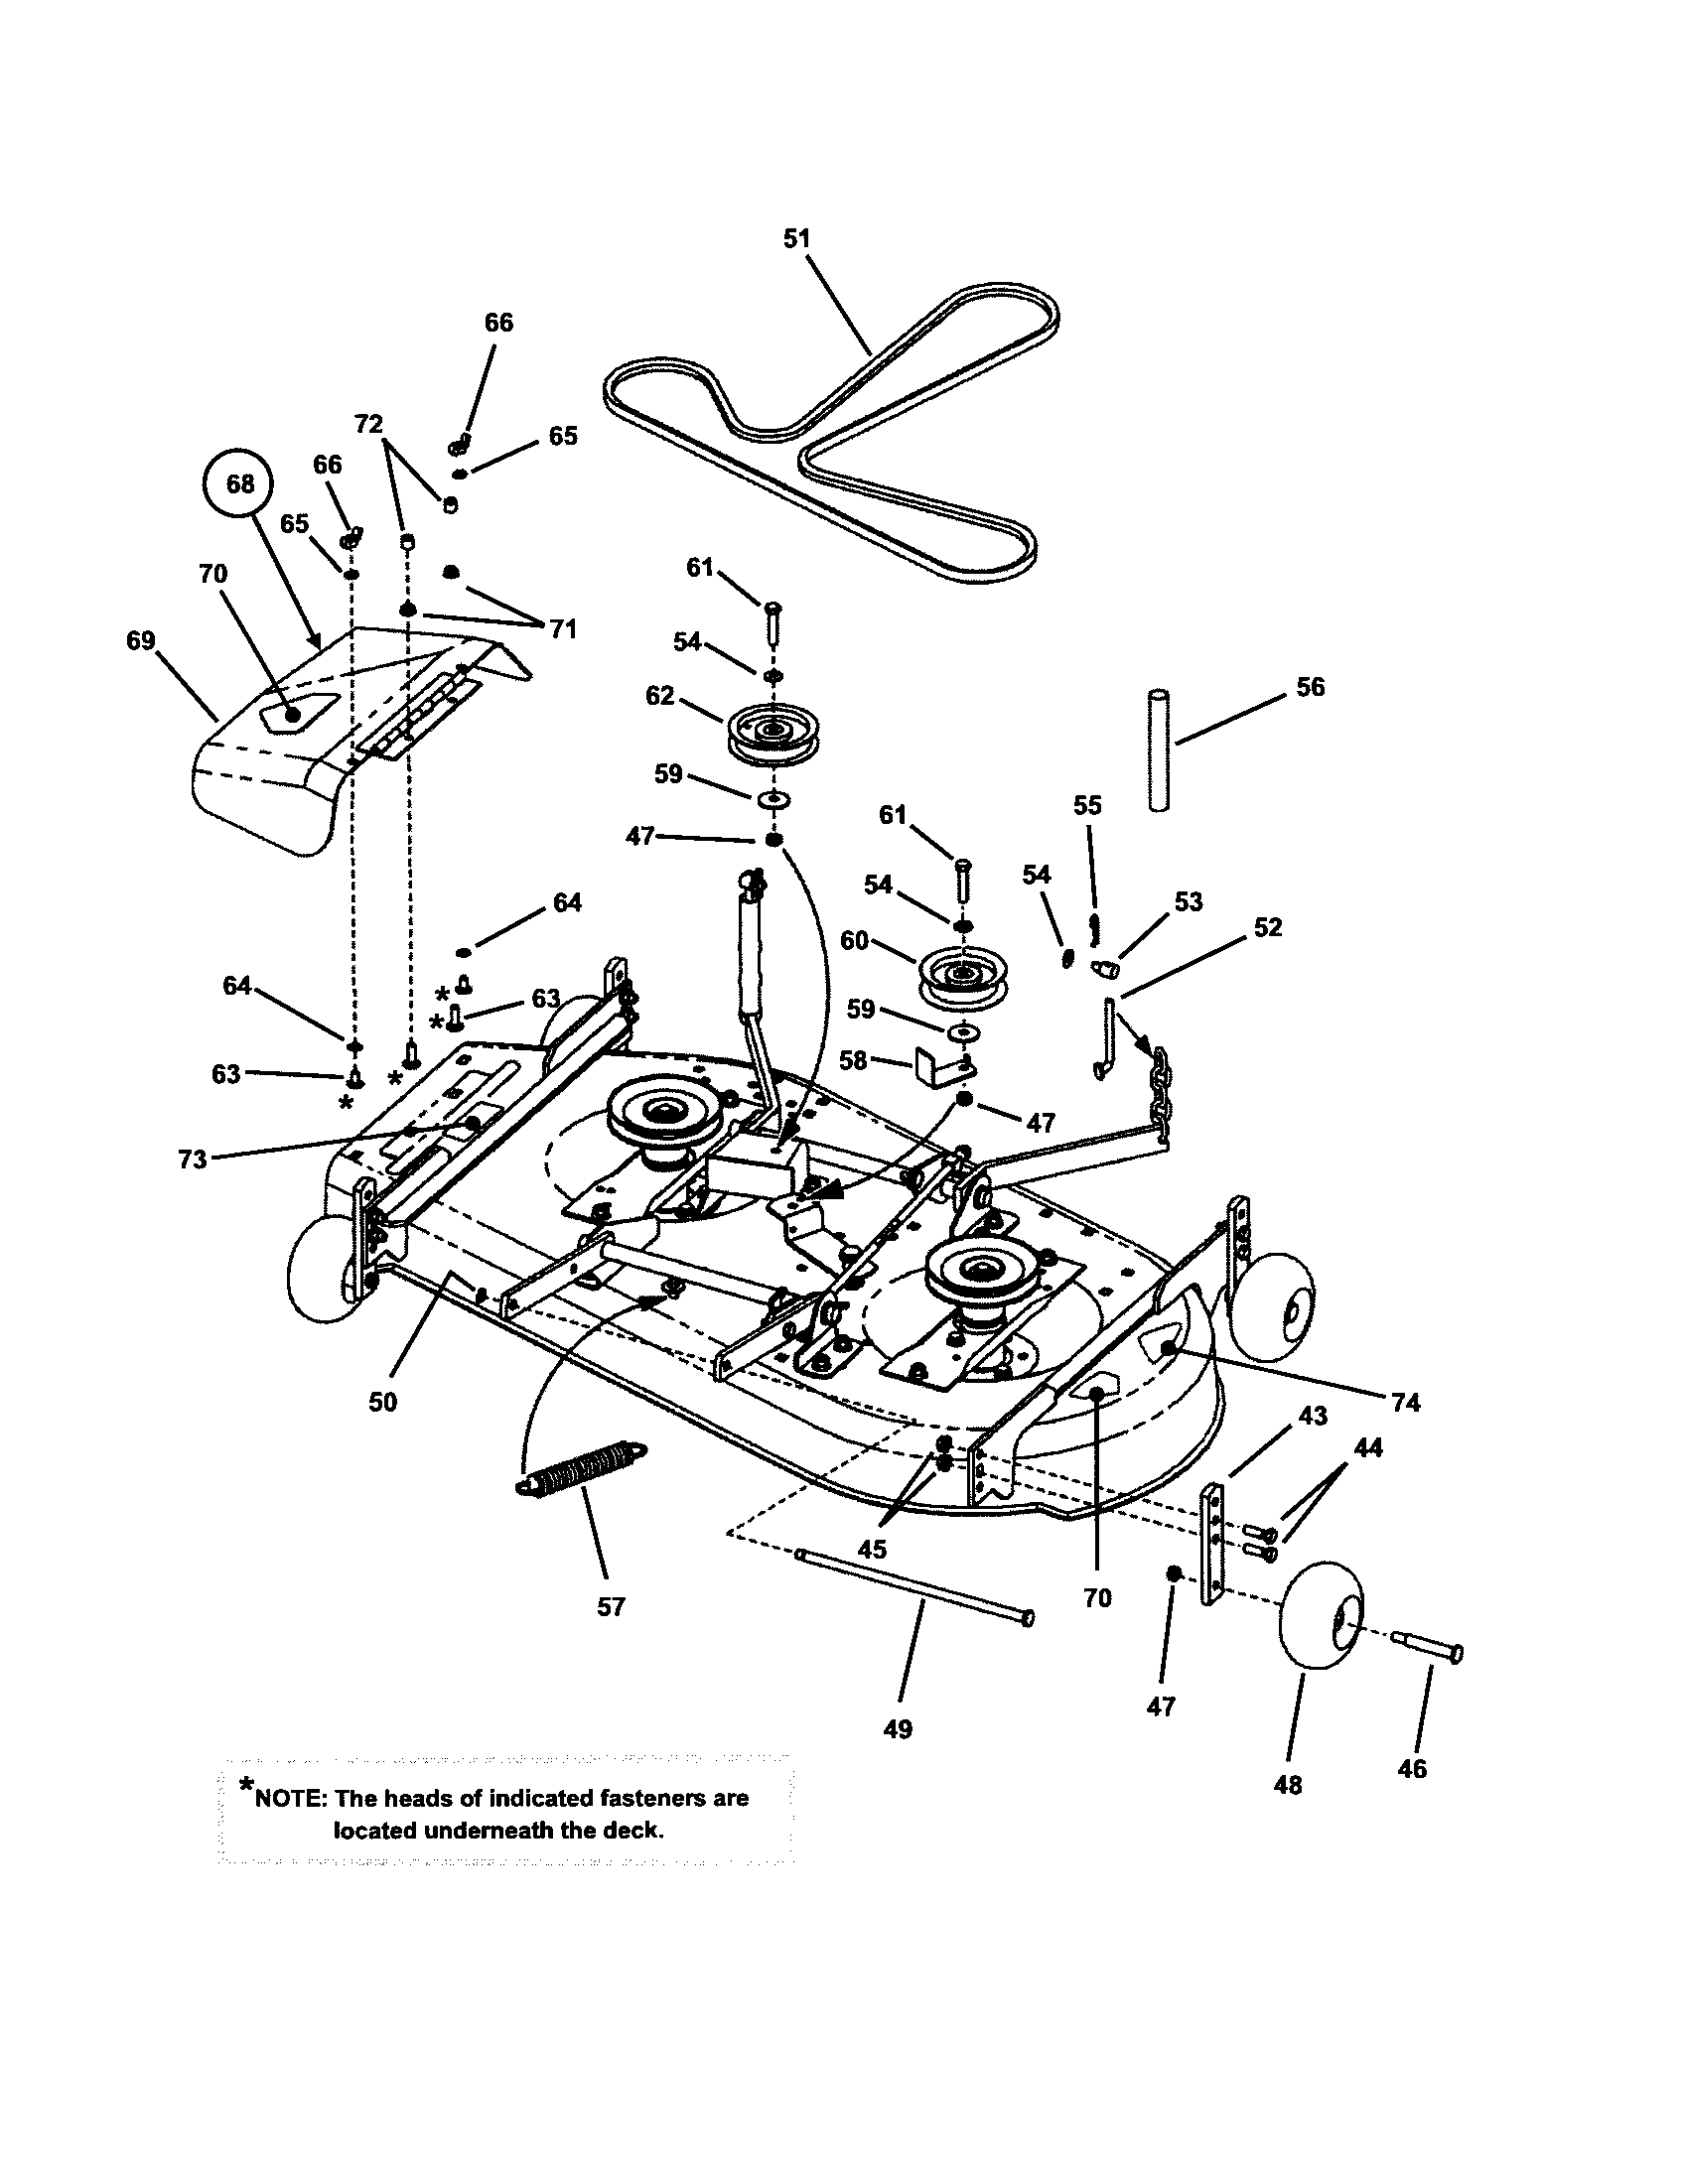 Wiring Diagram: 30 Snapper 42 Inch Deck Belt Diagram